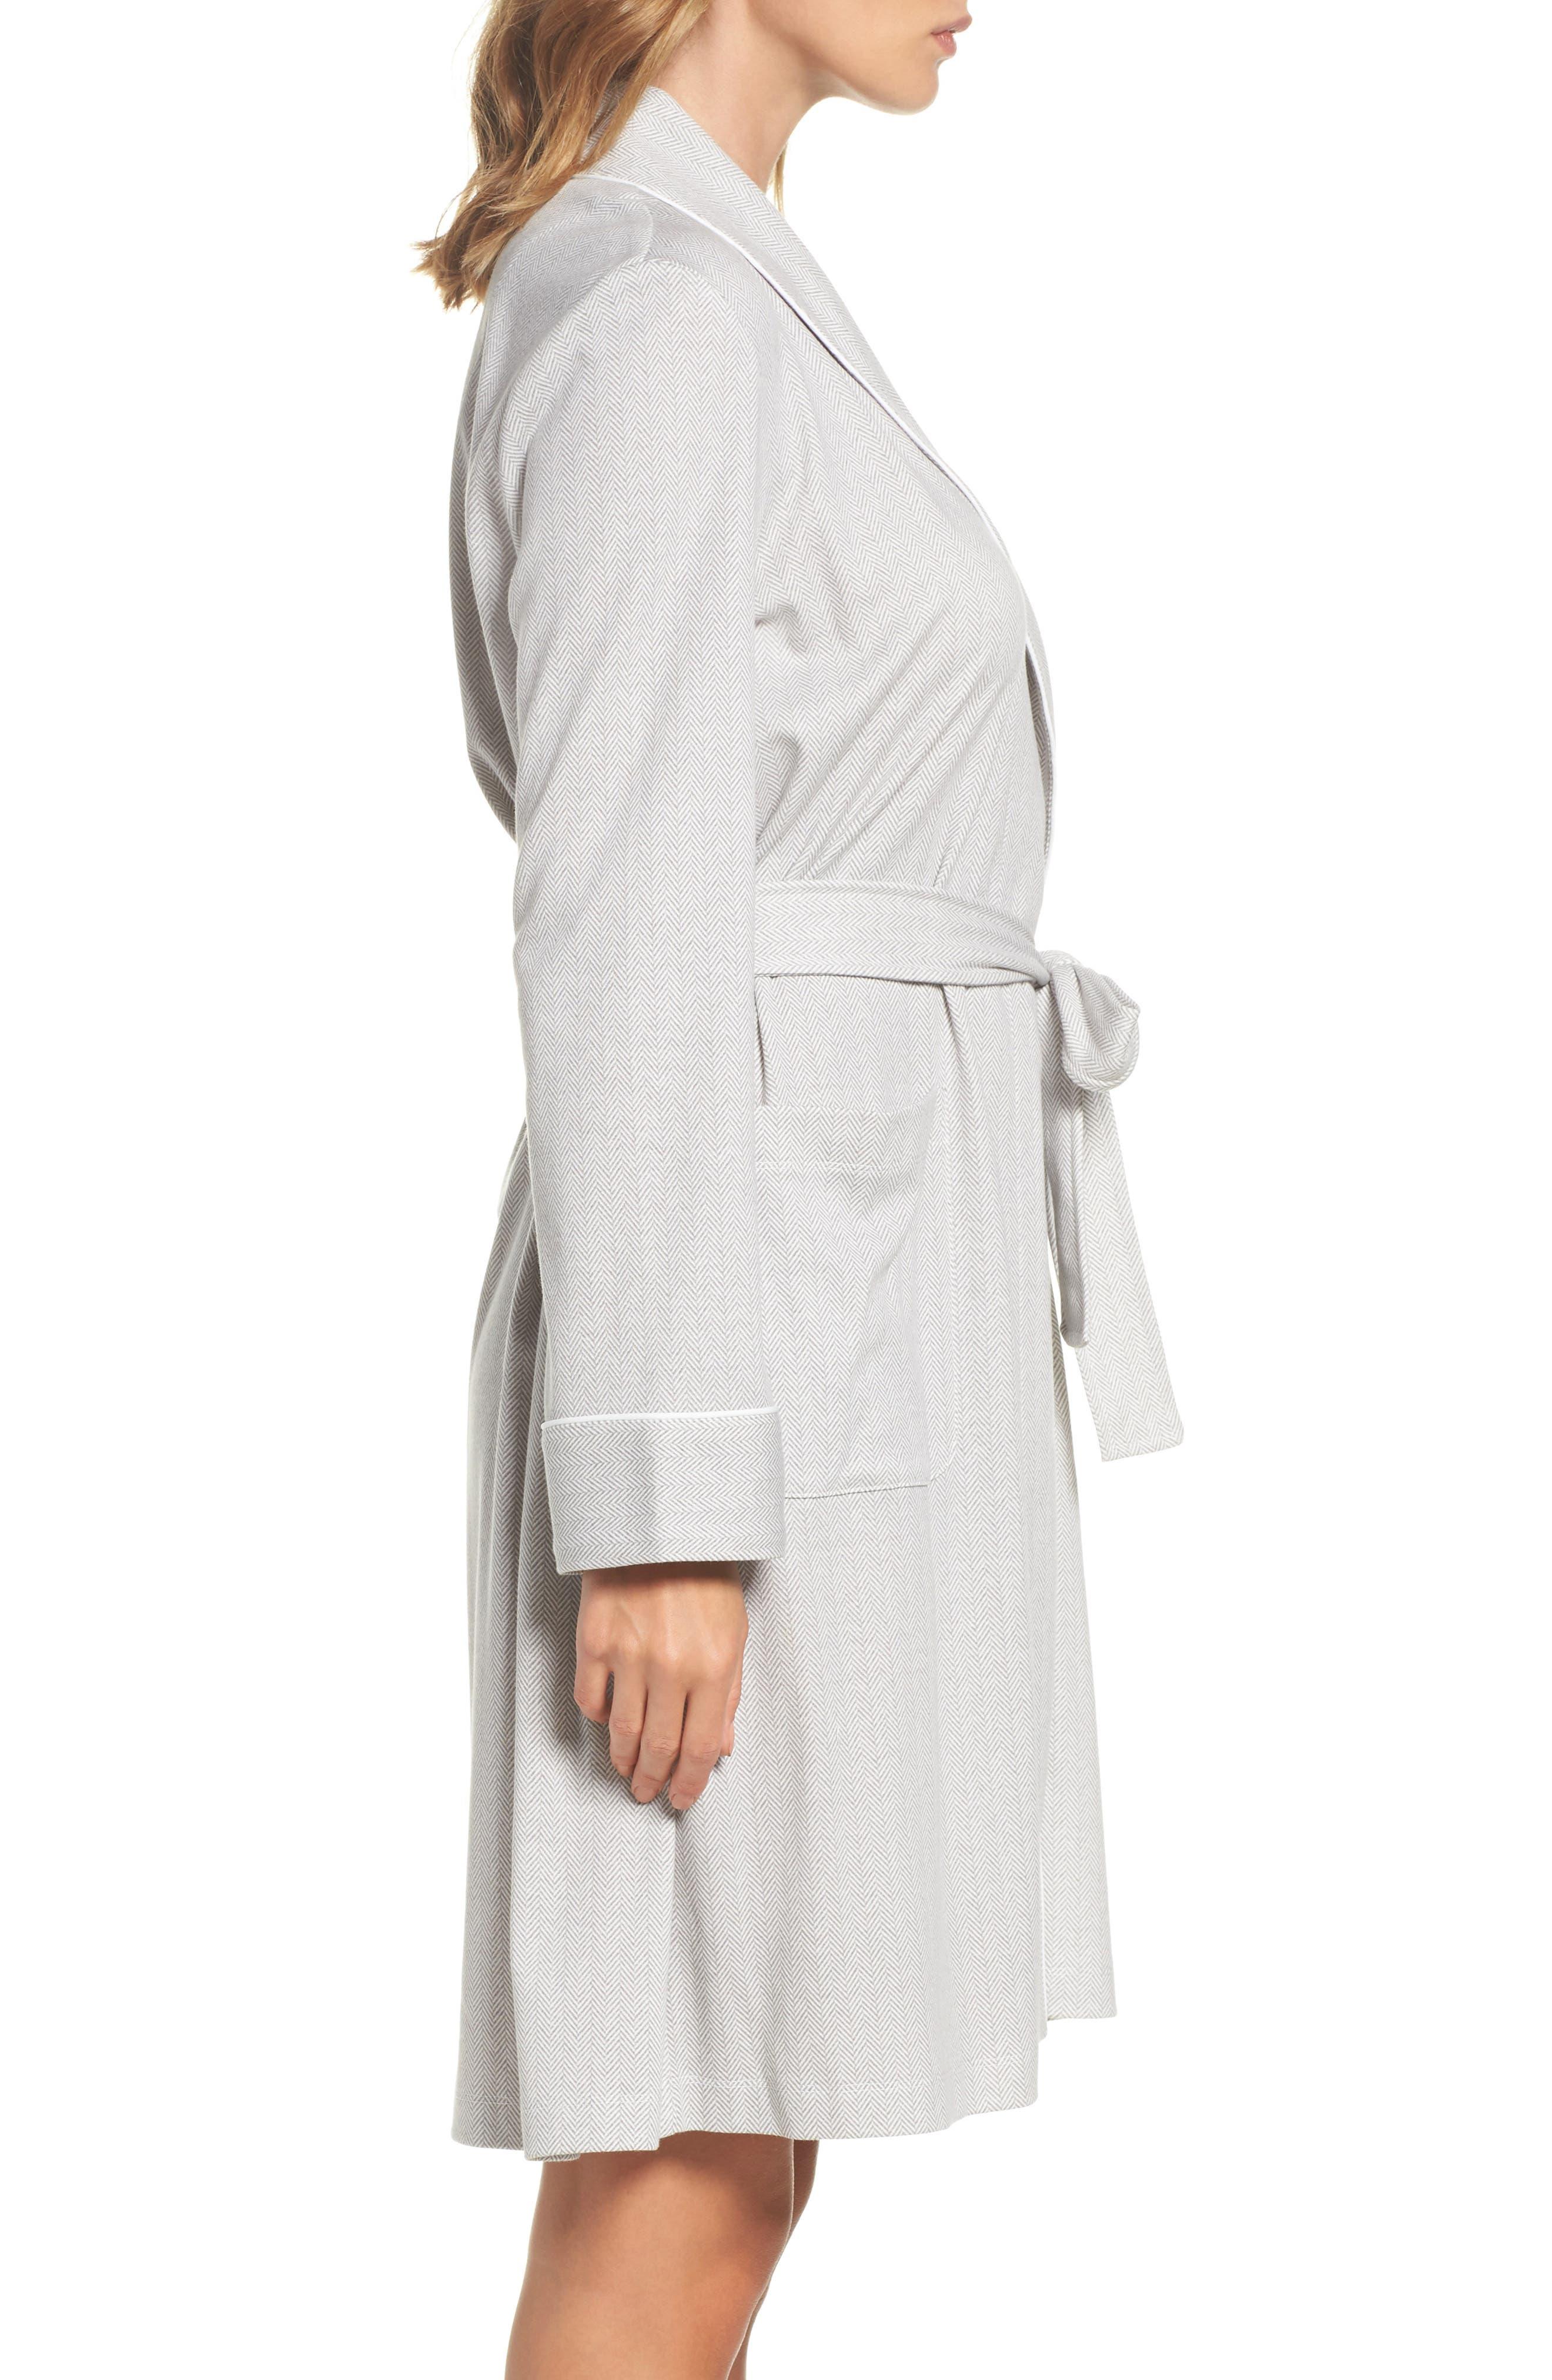 Short Robe,                             Alternate thumbnail 3, color,                             023